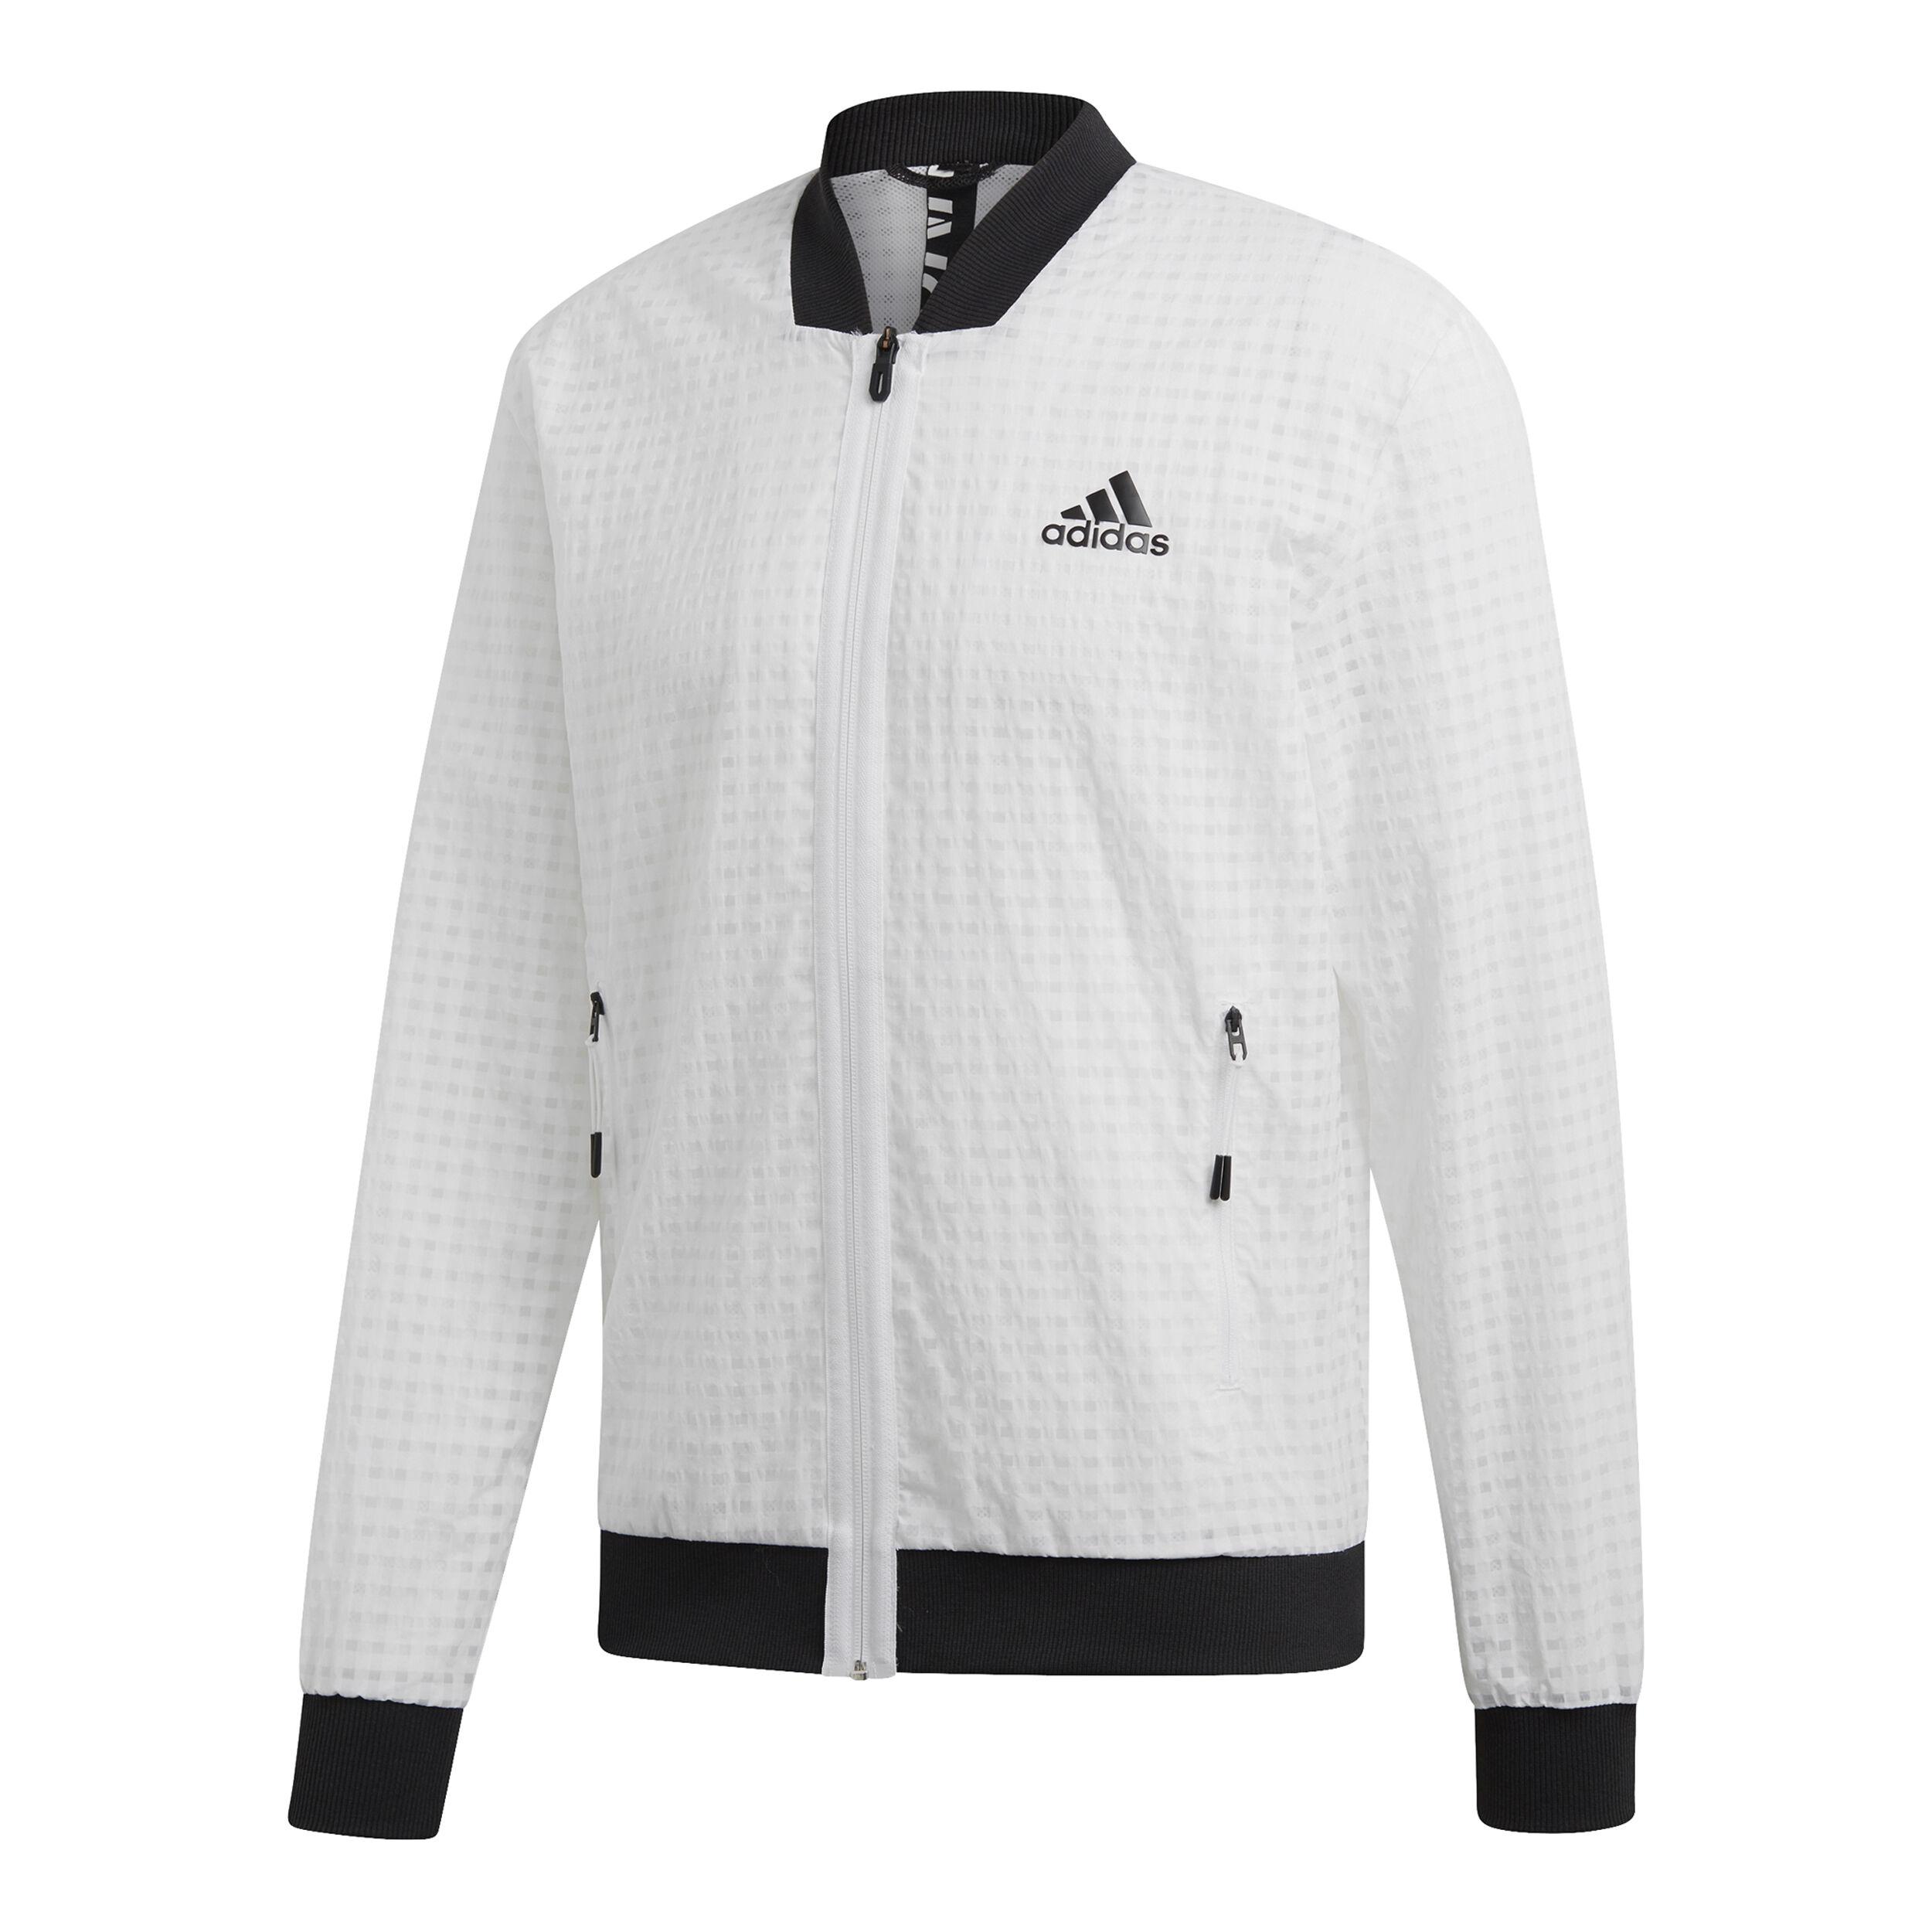 Kaufen Trainingsjacke Online, Weiß Schwarz Trainingsjacke